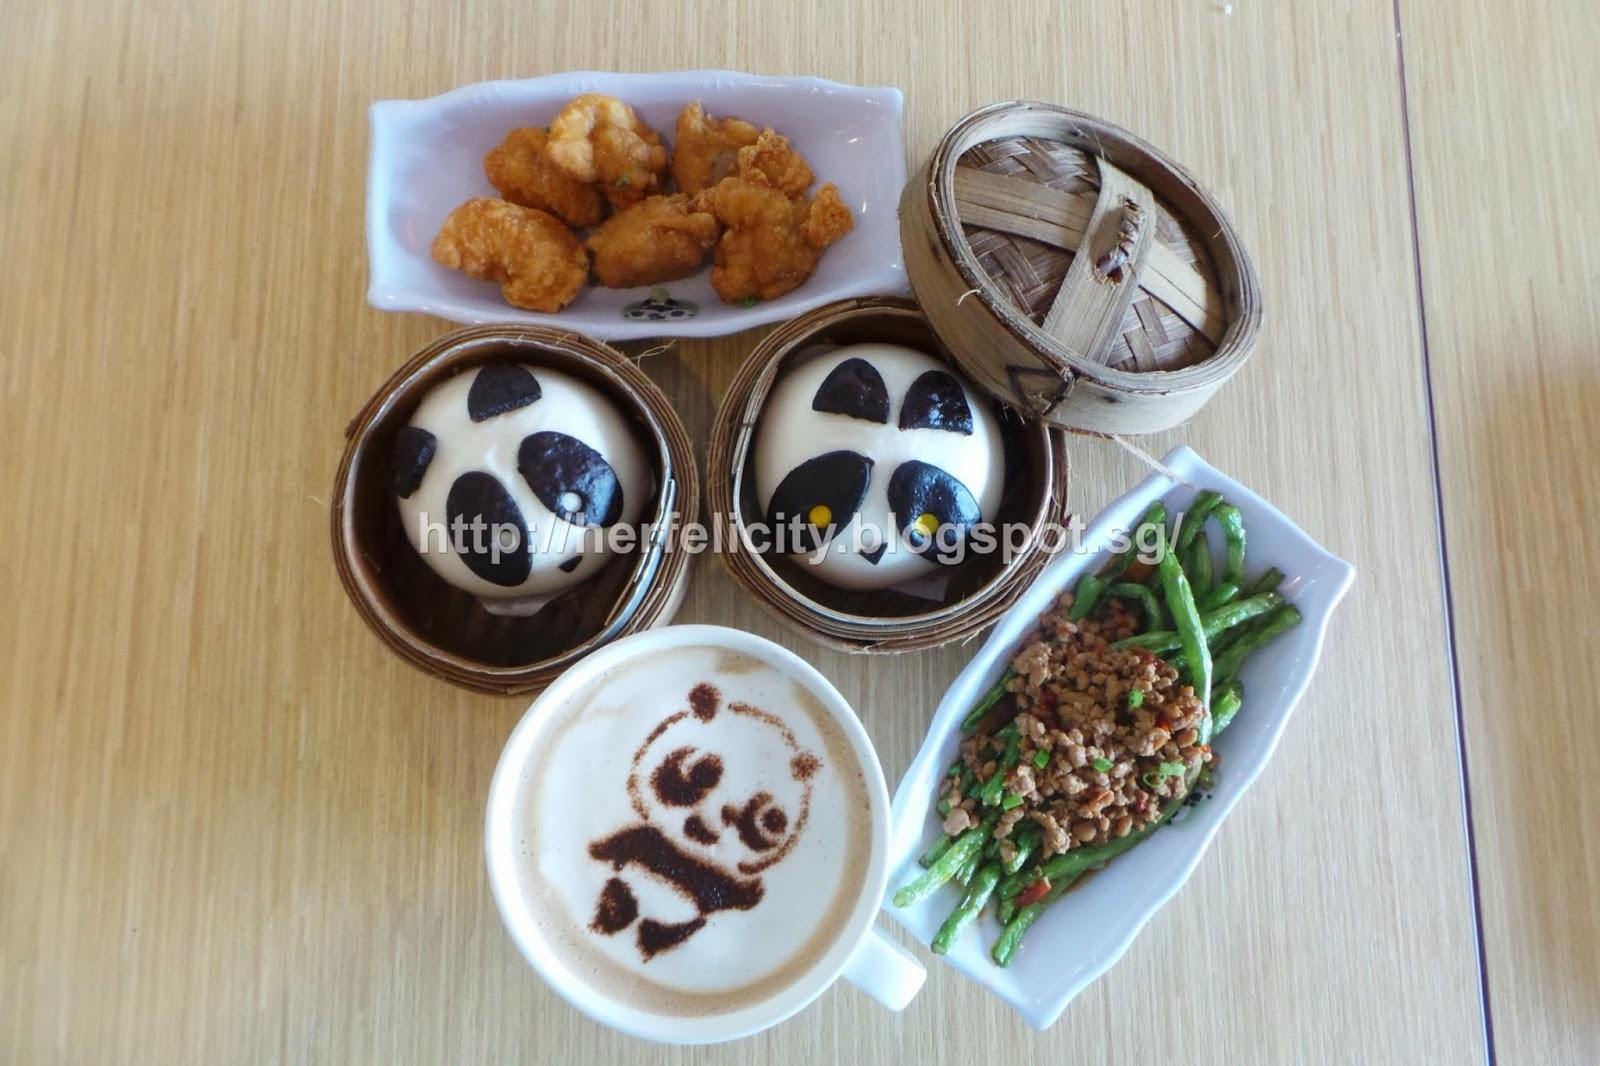 Lirong A Singapore Food And Lifestyle Blog Review Mama Panda 39 S Kitchen